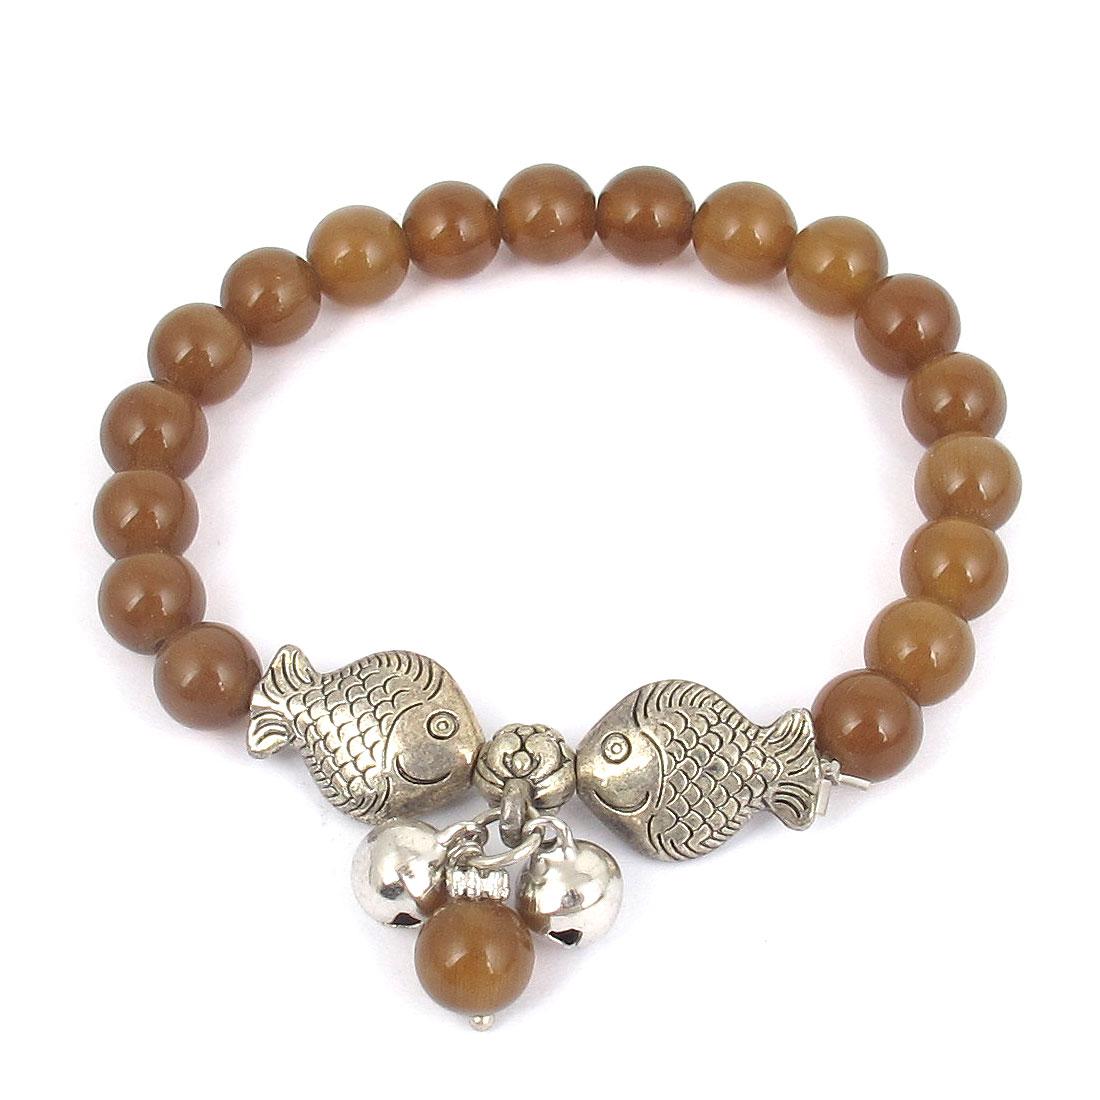 Fish Detail Round Opal Bead Wrist Ornament Bangle Bracelet Brown Silver Tone for Women